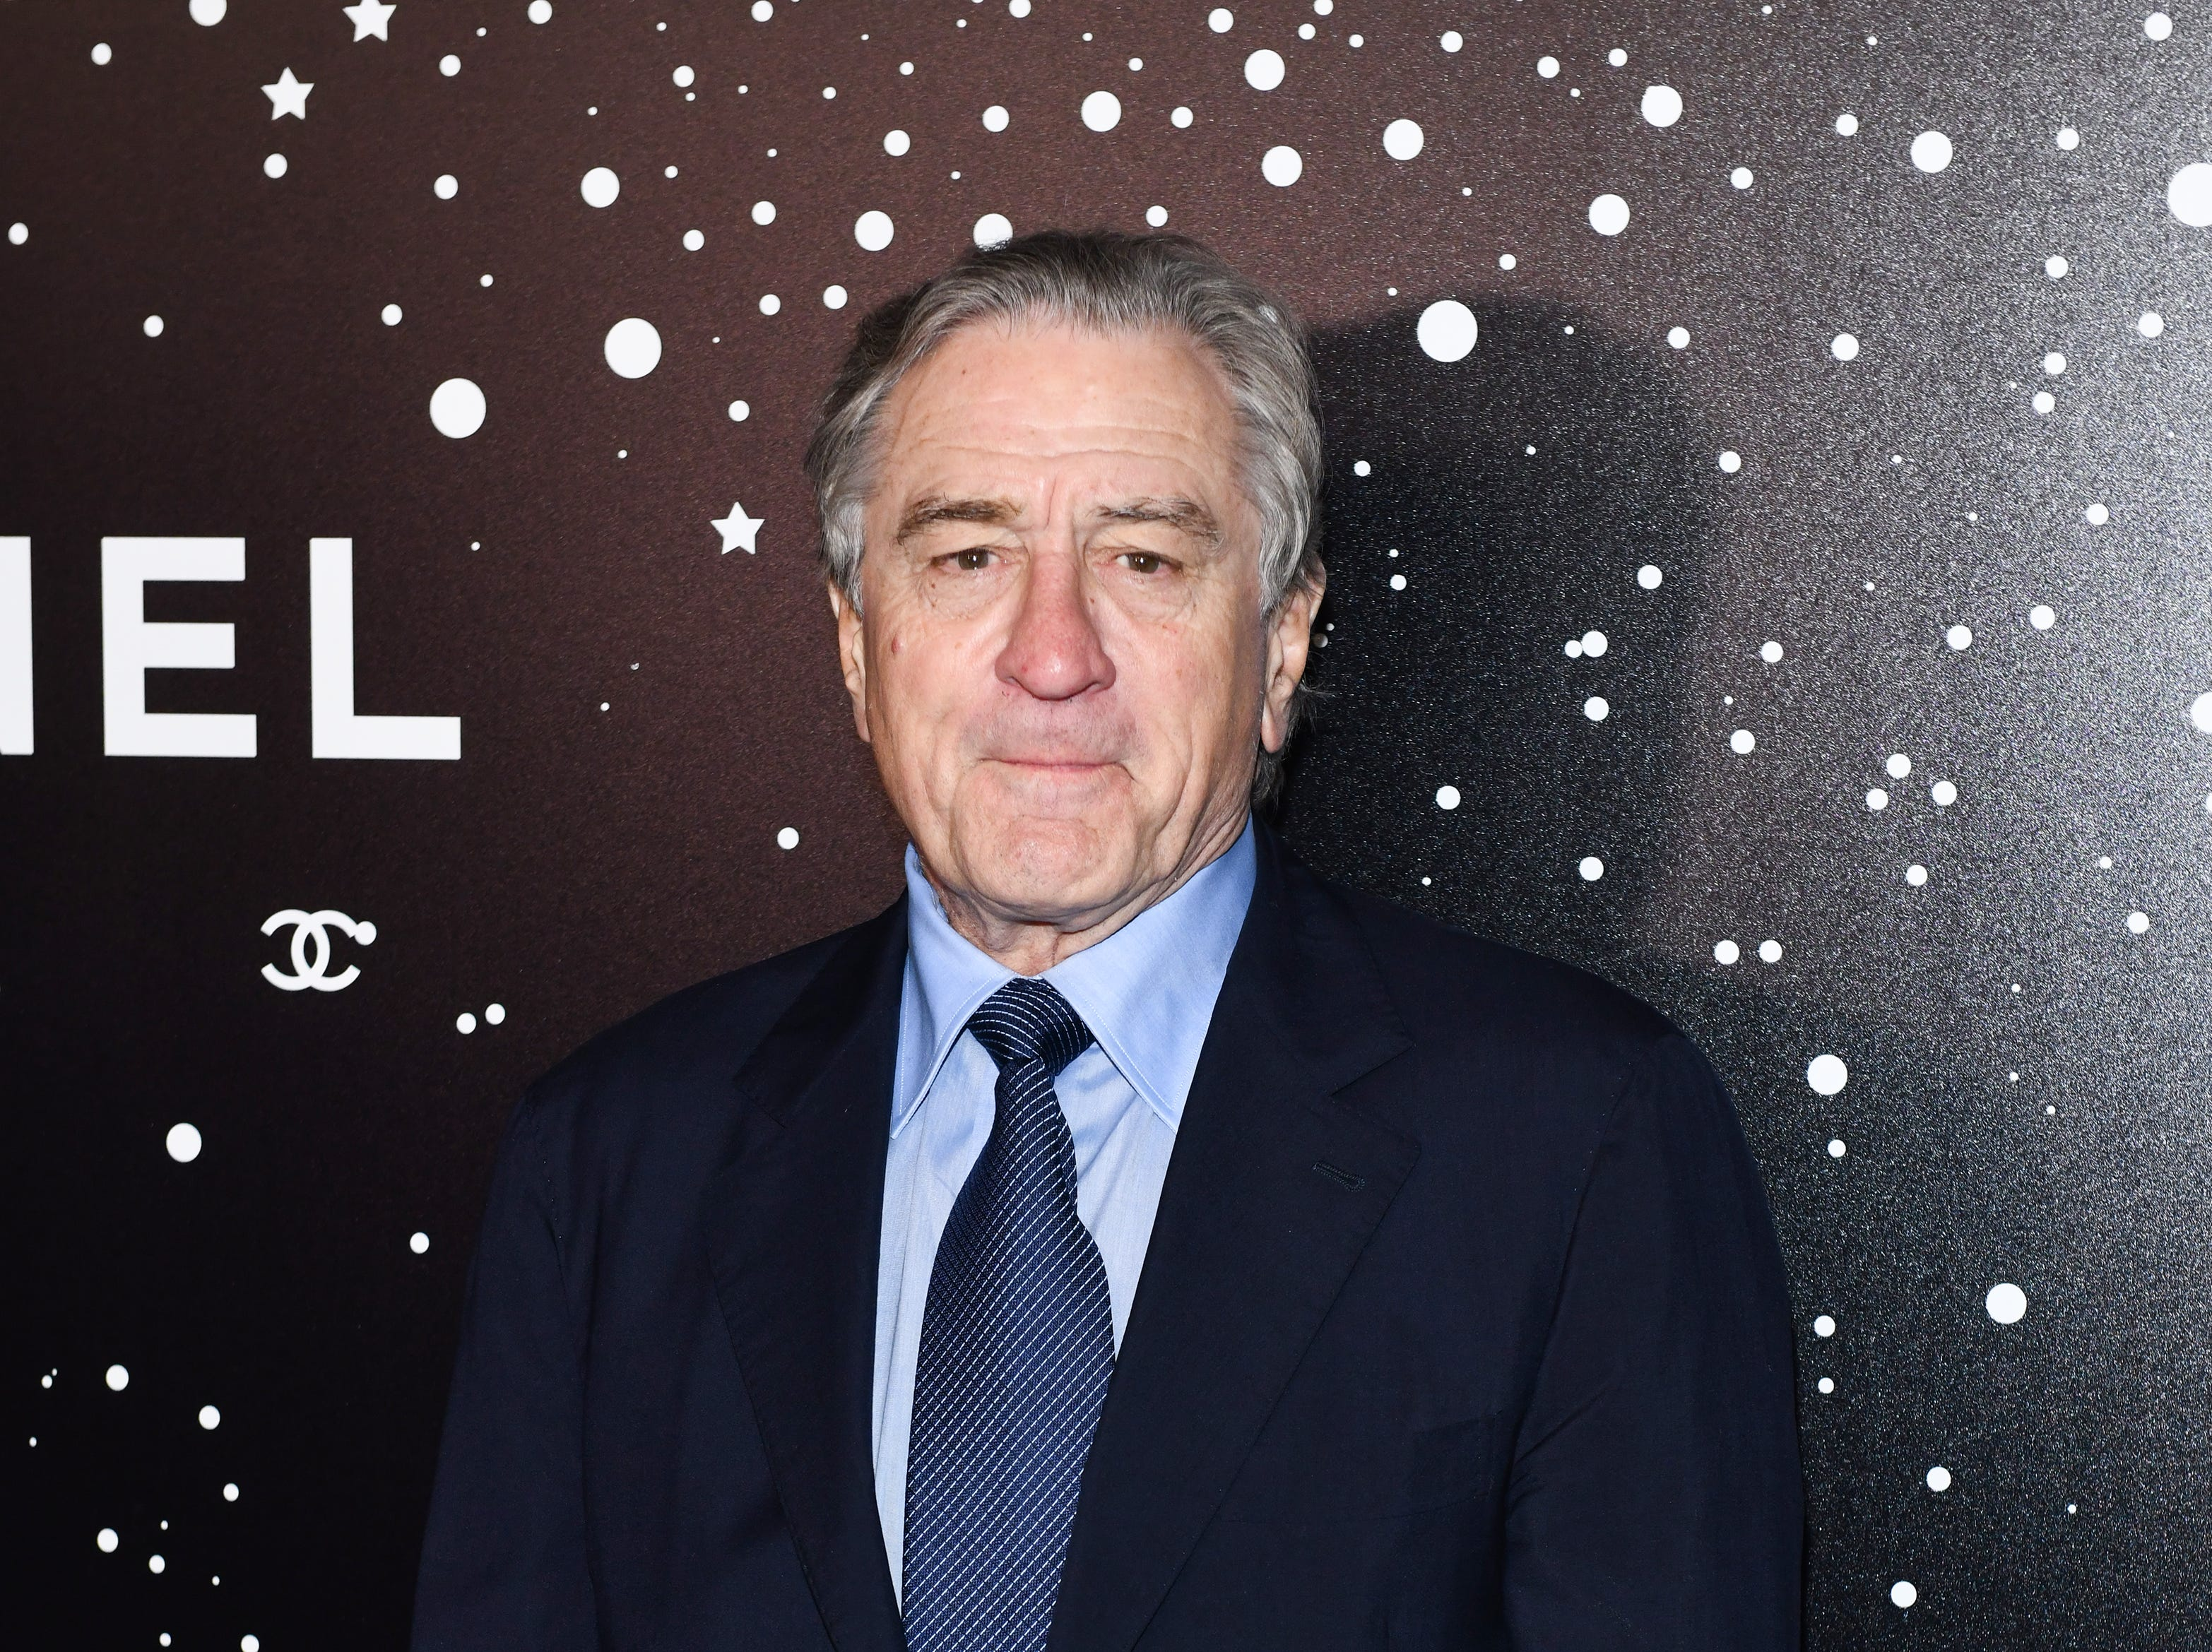 NEW YORK, NEW YORK - NOVEMBER 19: Robert De Niro attends the 2018 Museum of Modern Art Film Benefit: A Tribute To Martin Scorsese at Museum of Modern Art on November 19, 2018 in New York City. (Photo by Noam Galai/FilmMagic) ORG XMIT: 775259312 ORIG FILE ID: 1069869254